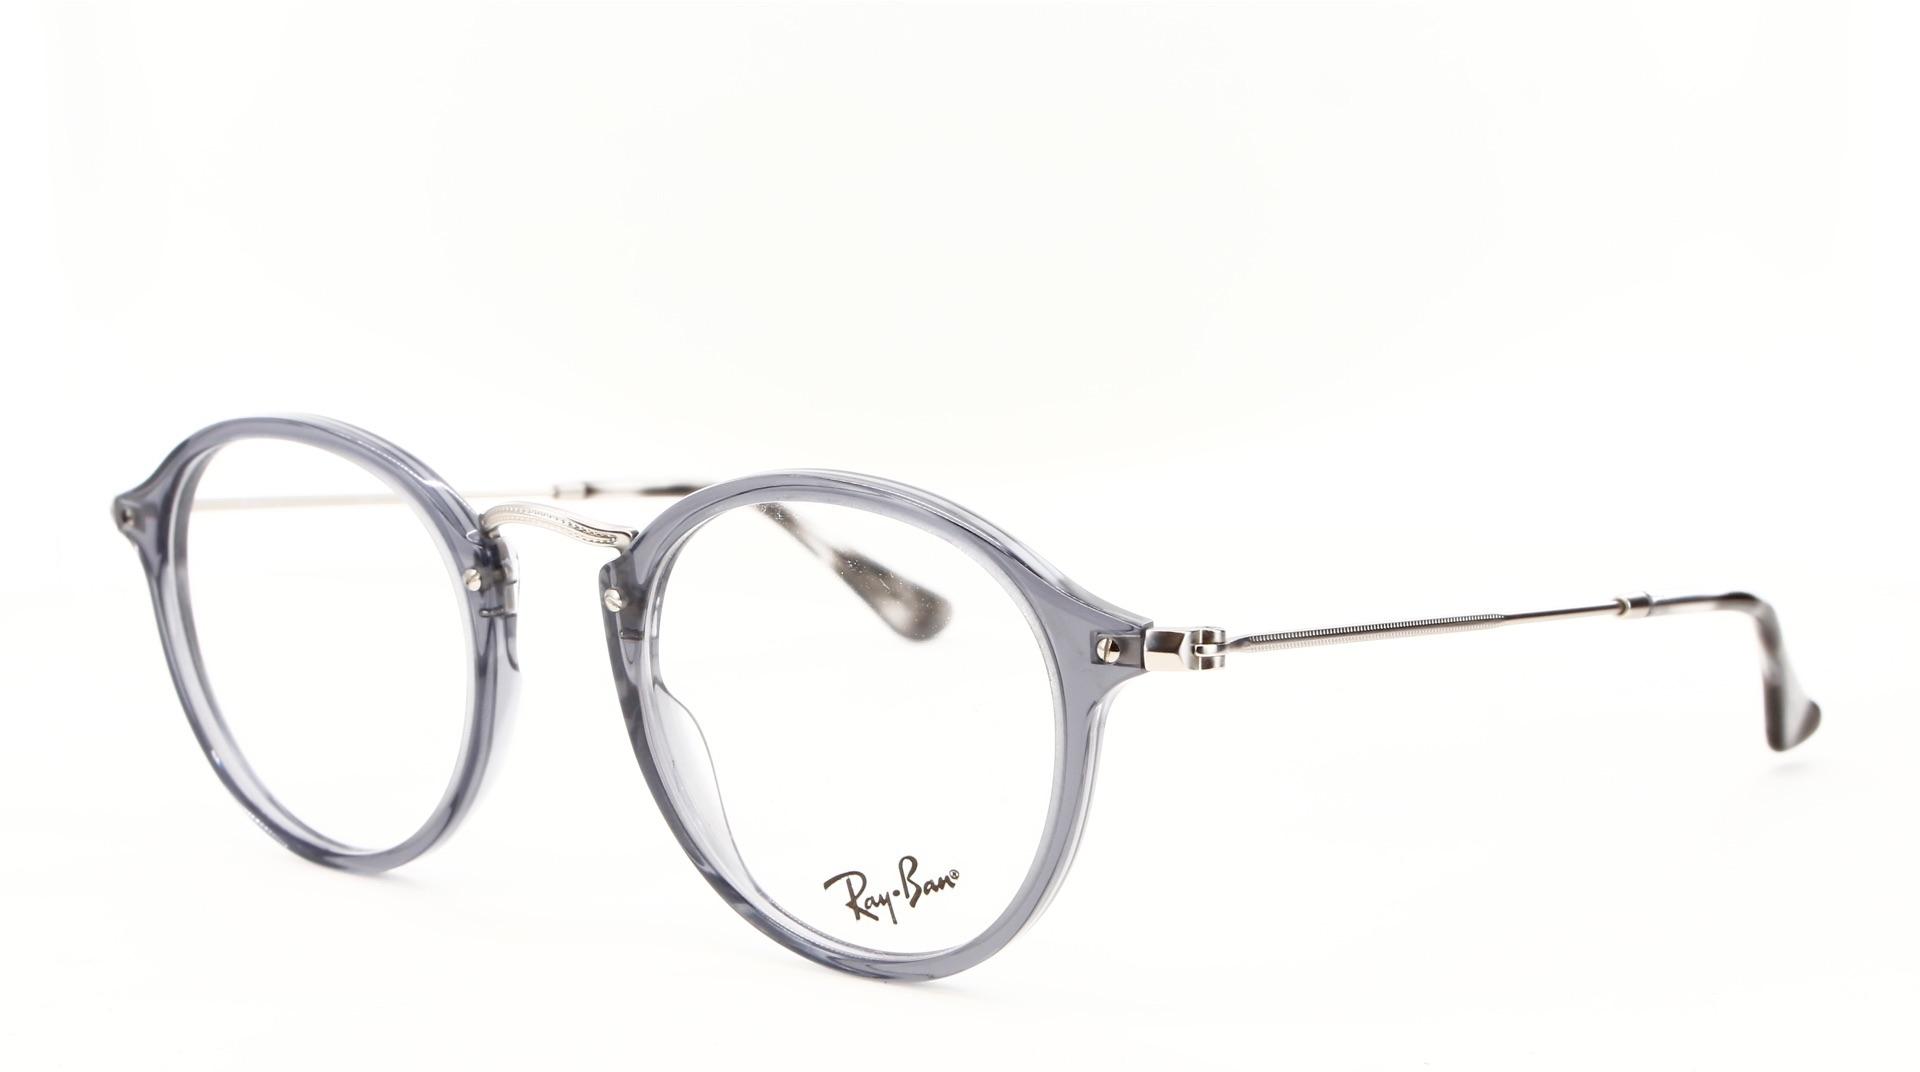 78767 ray ban brillen en monturen claeyssens optic brugge gent. Black Bedroom Furniture Sets. Home Design Ideas